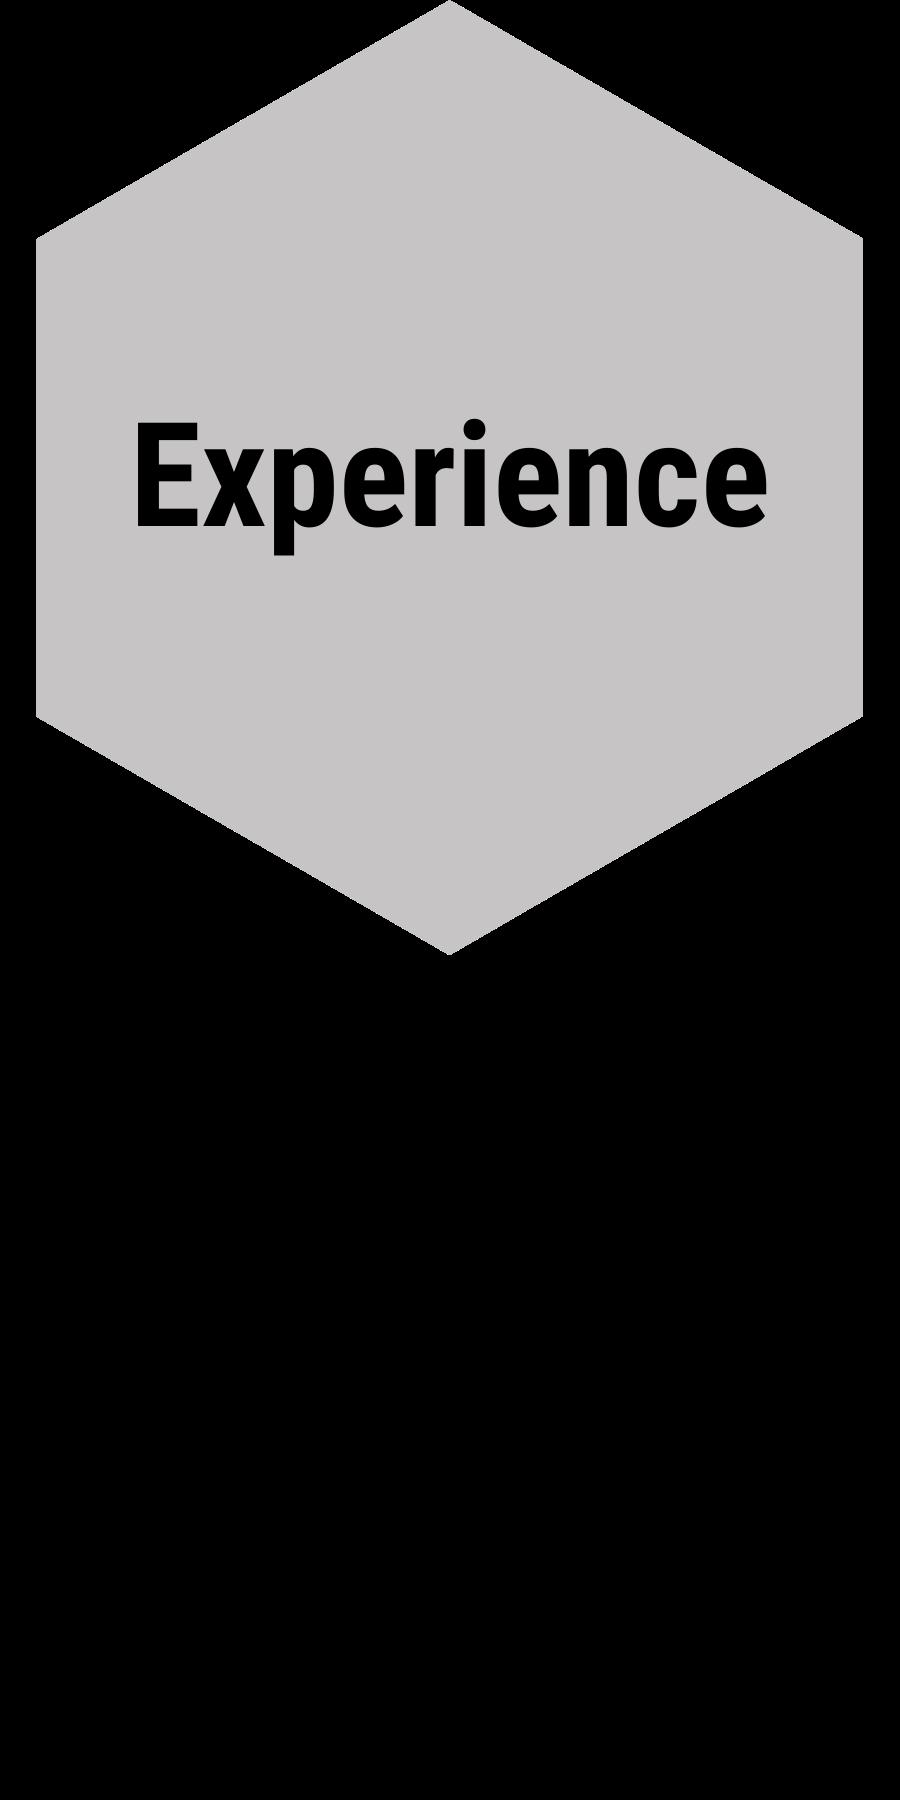 Transform Organizational Training through Real Life Experiences